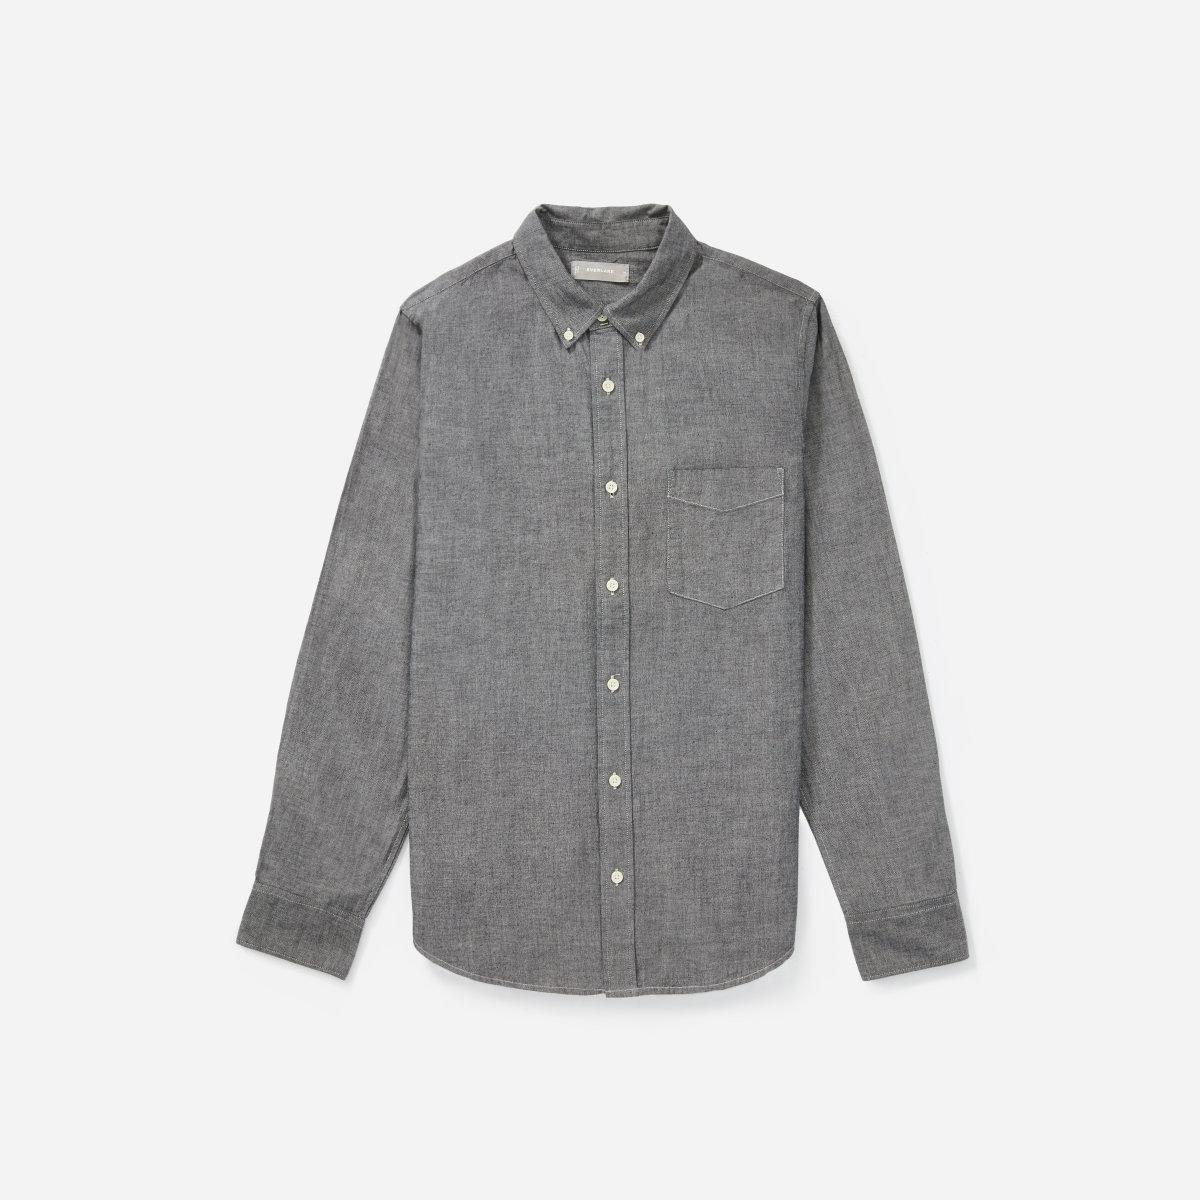 Everlane chambray shirt